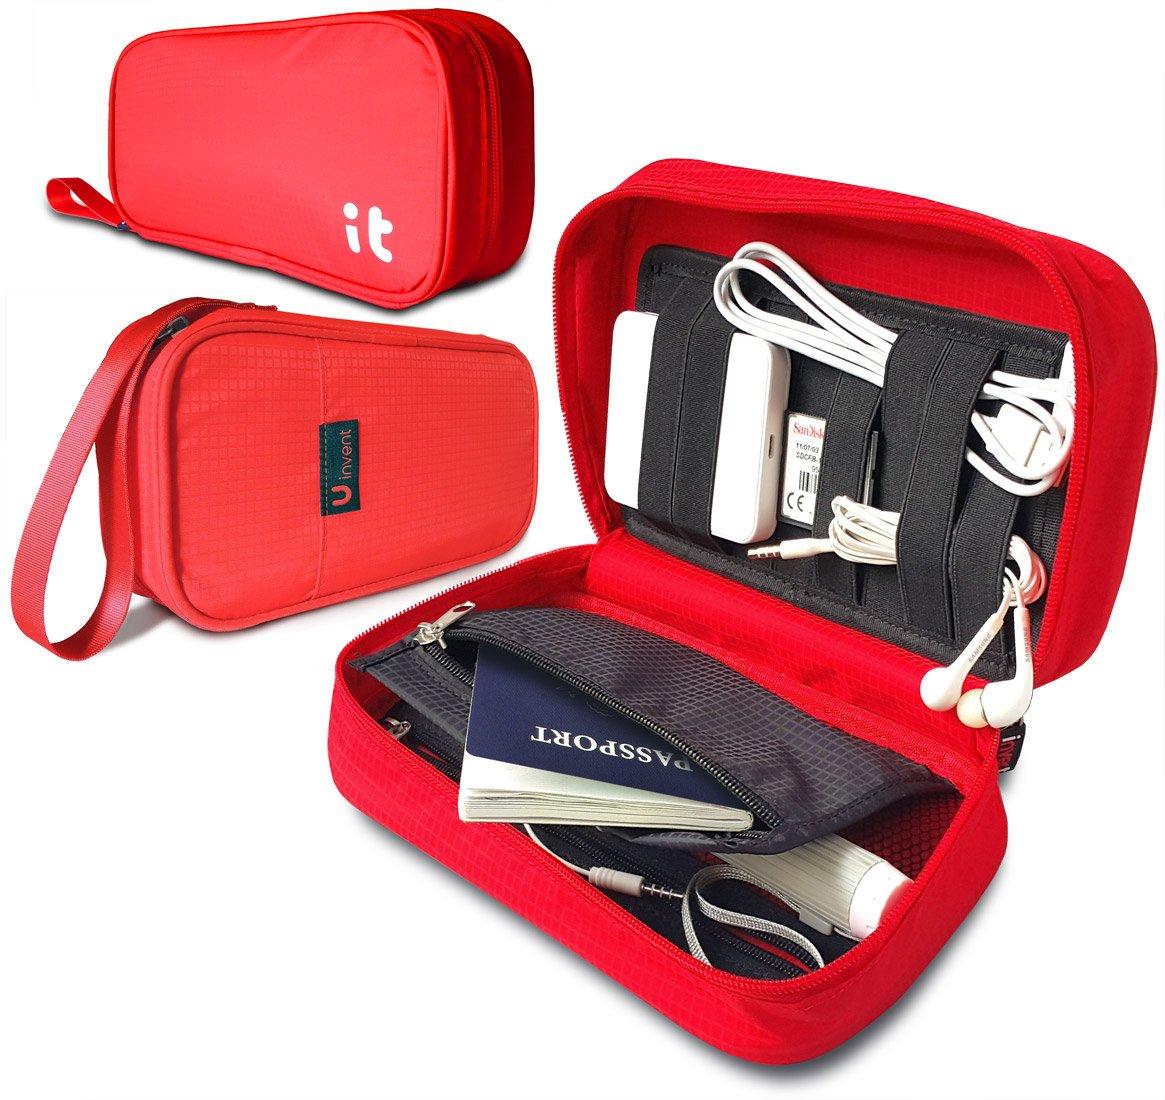 Travel Cord Organizer Electronics Accessories Case